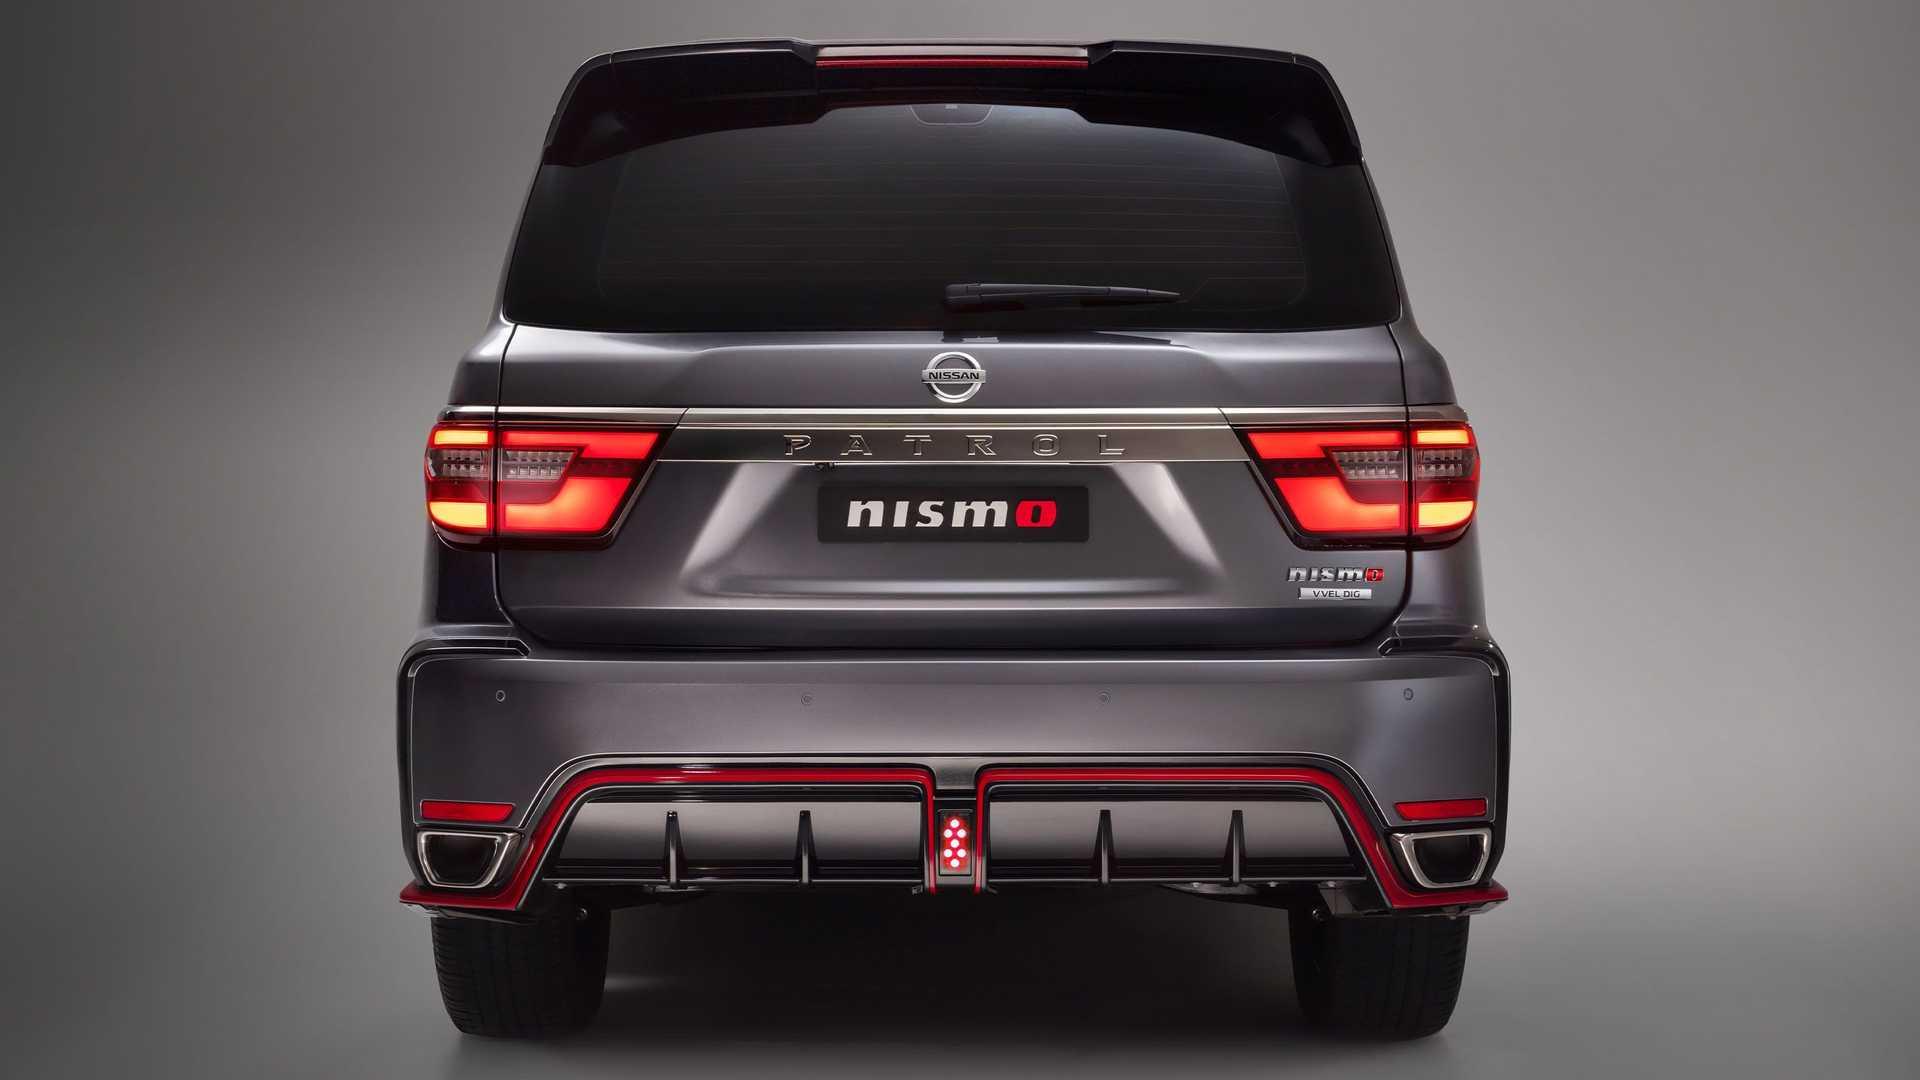 2022-nissan-patrol-nismo-facelift-3